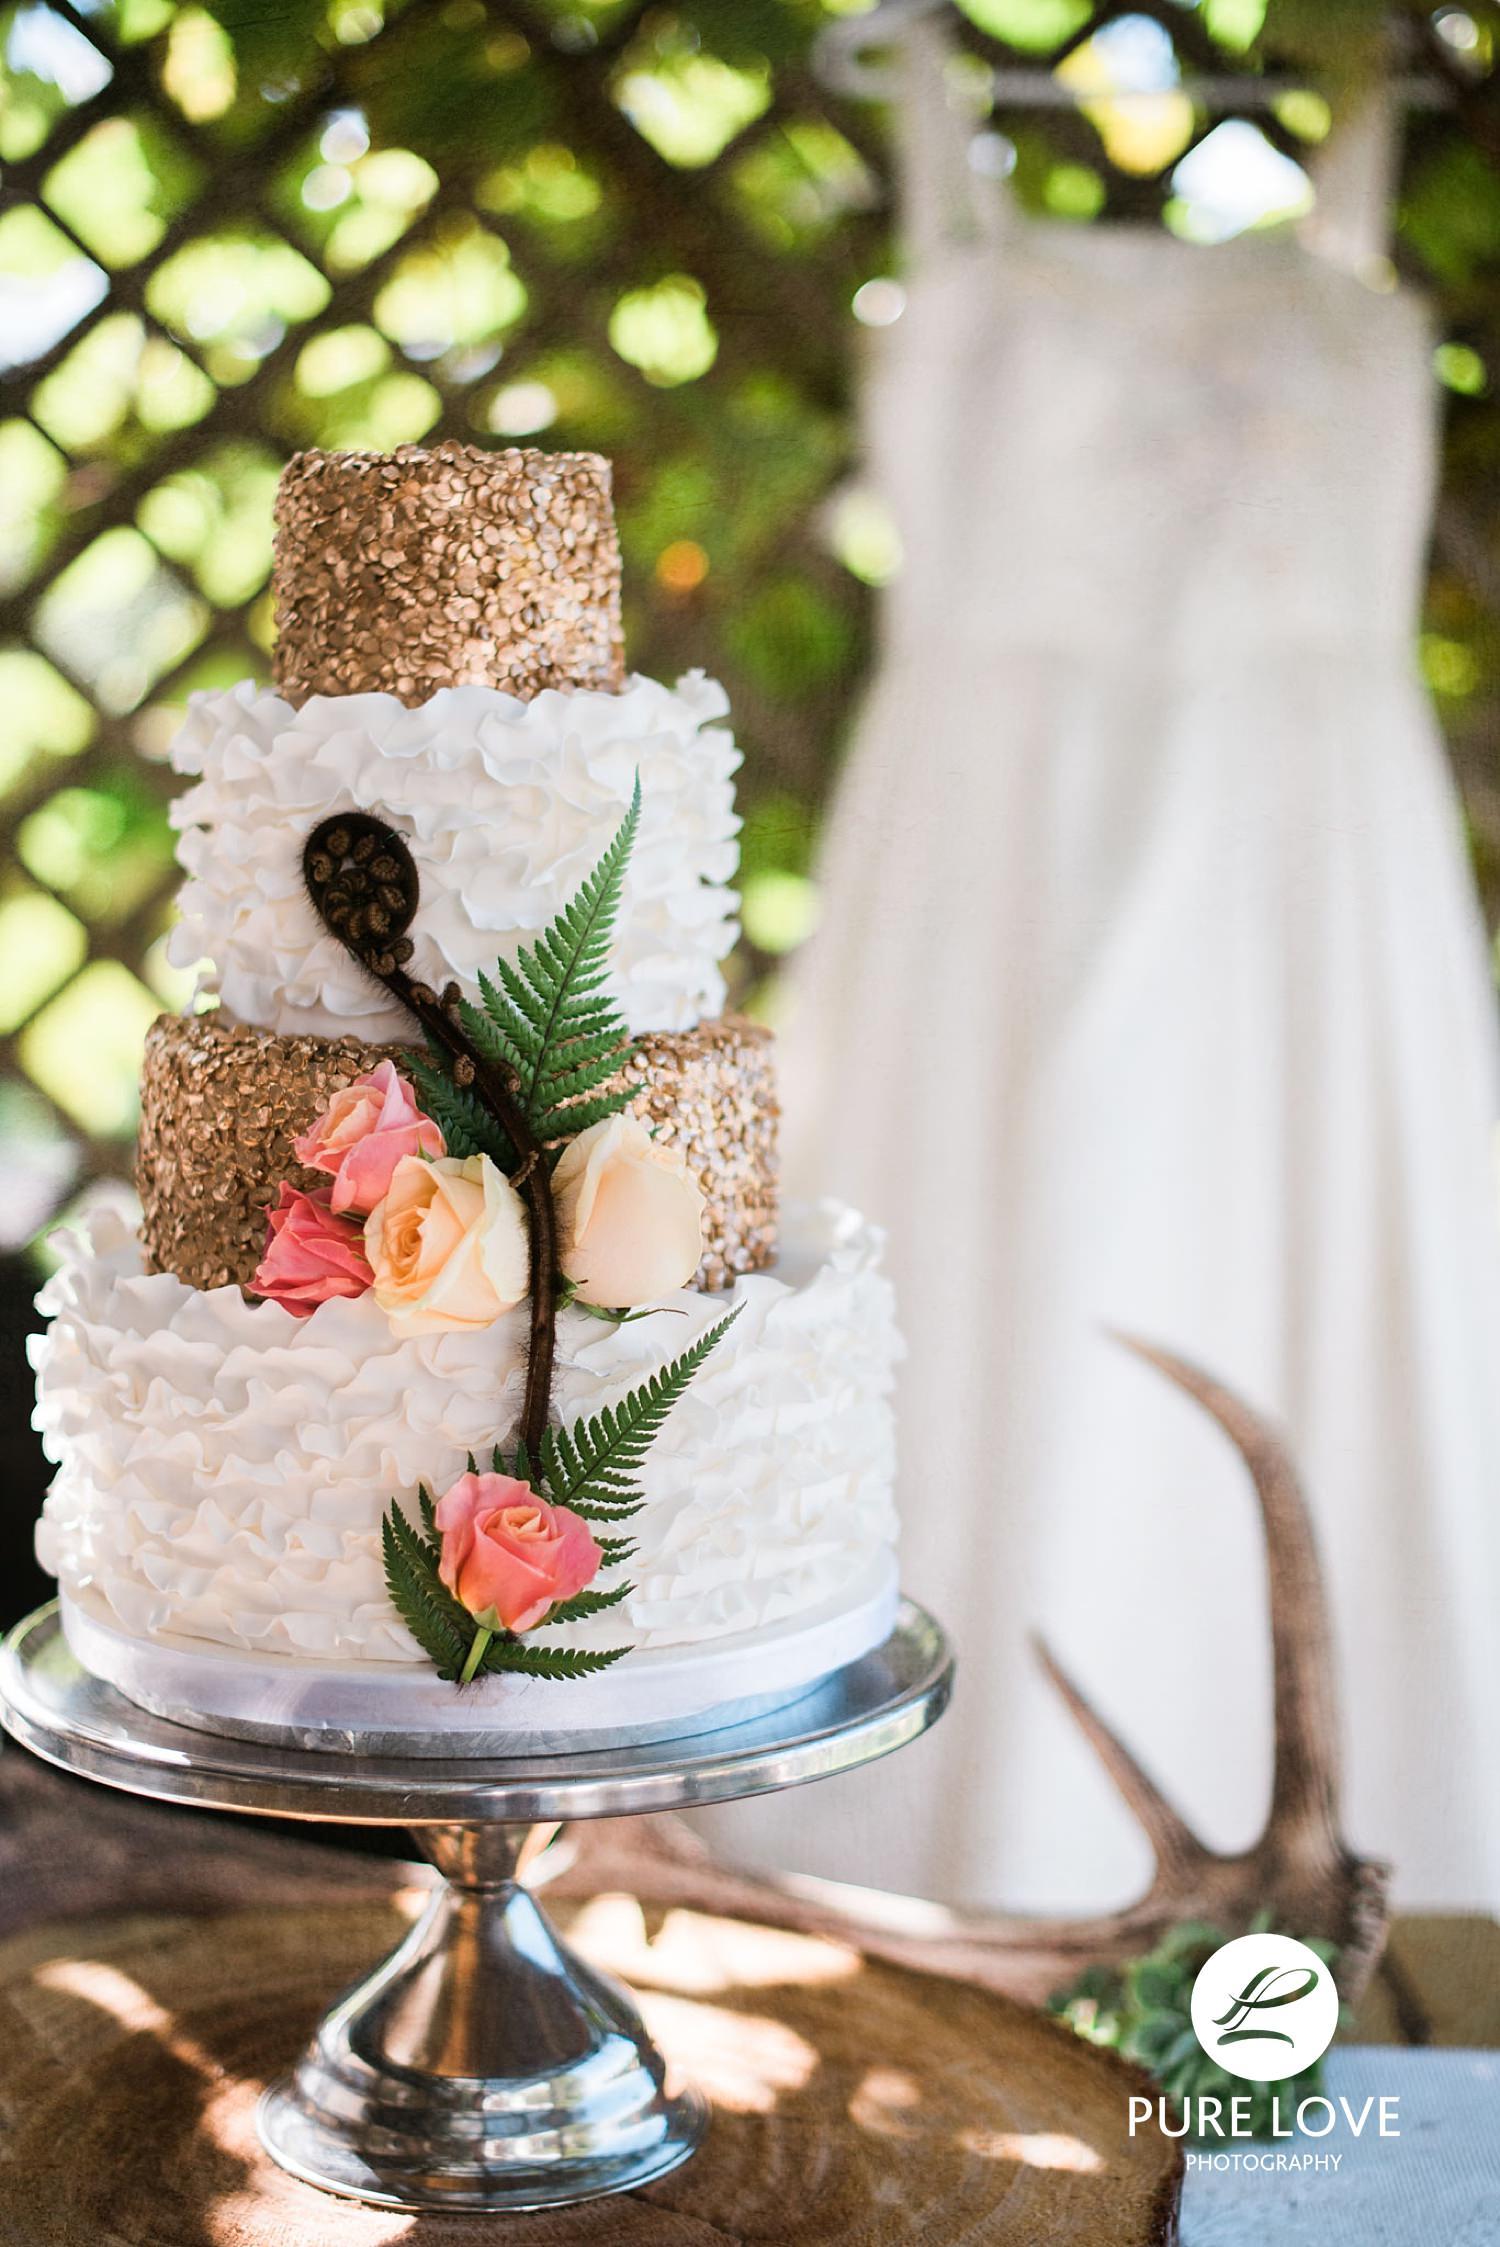 Gorgeous rustic wedding cake made by  Our Cake Company , Rotorua.